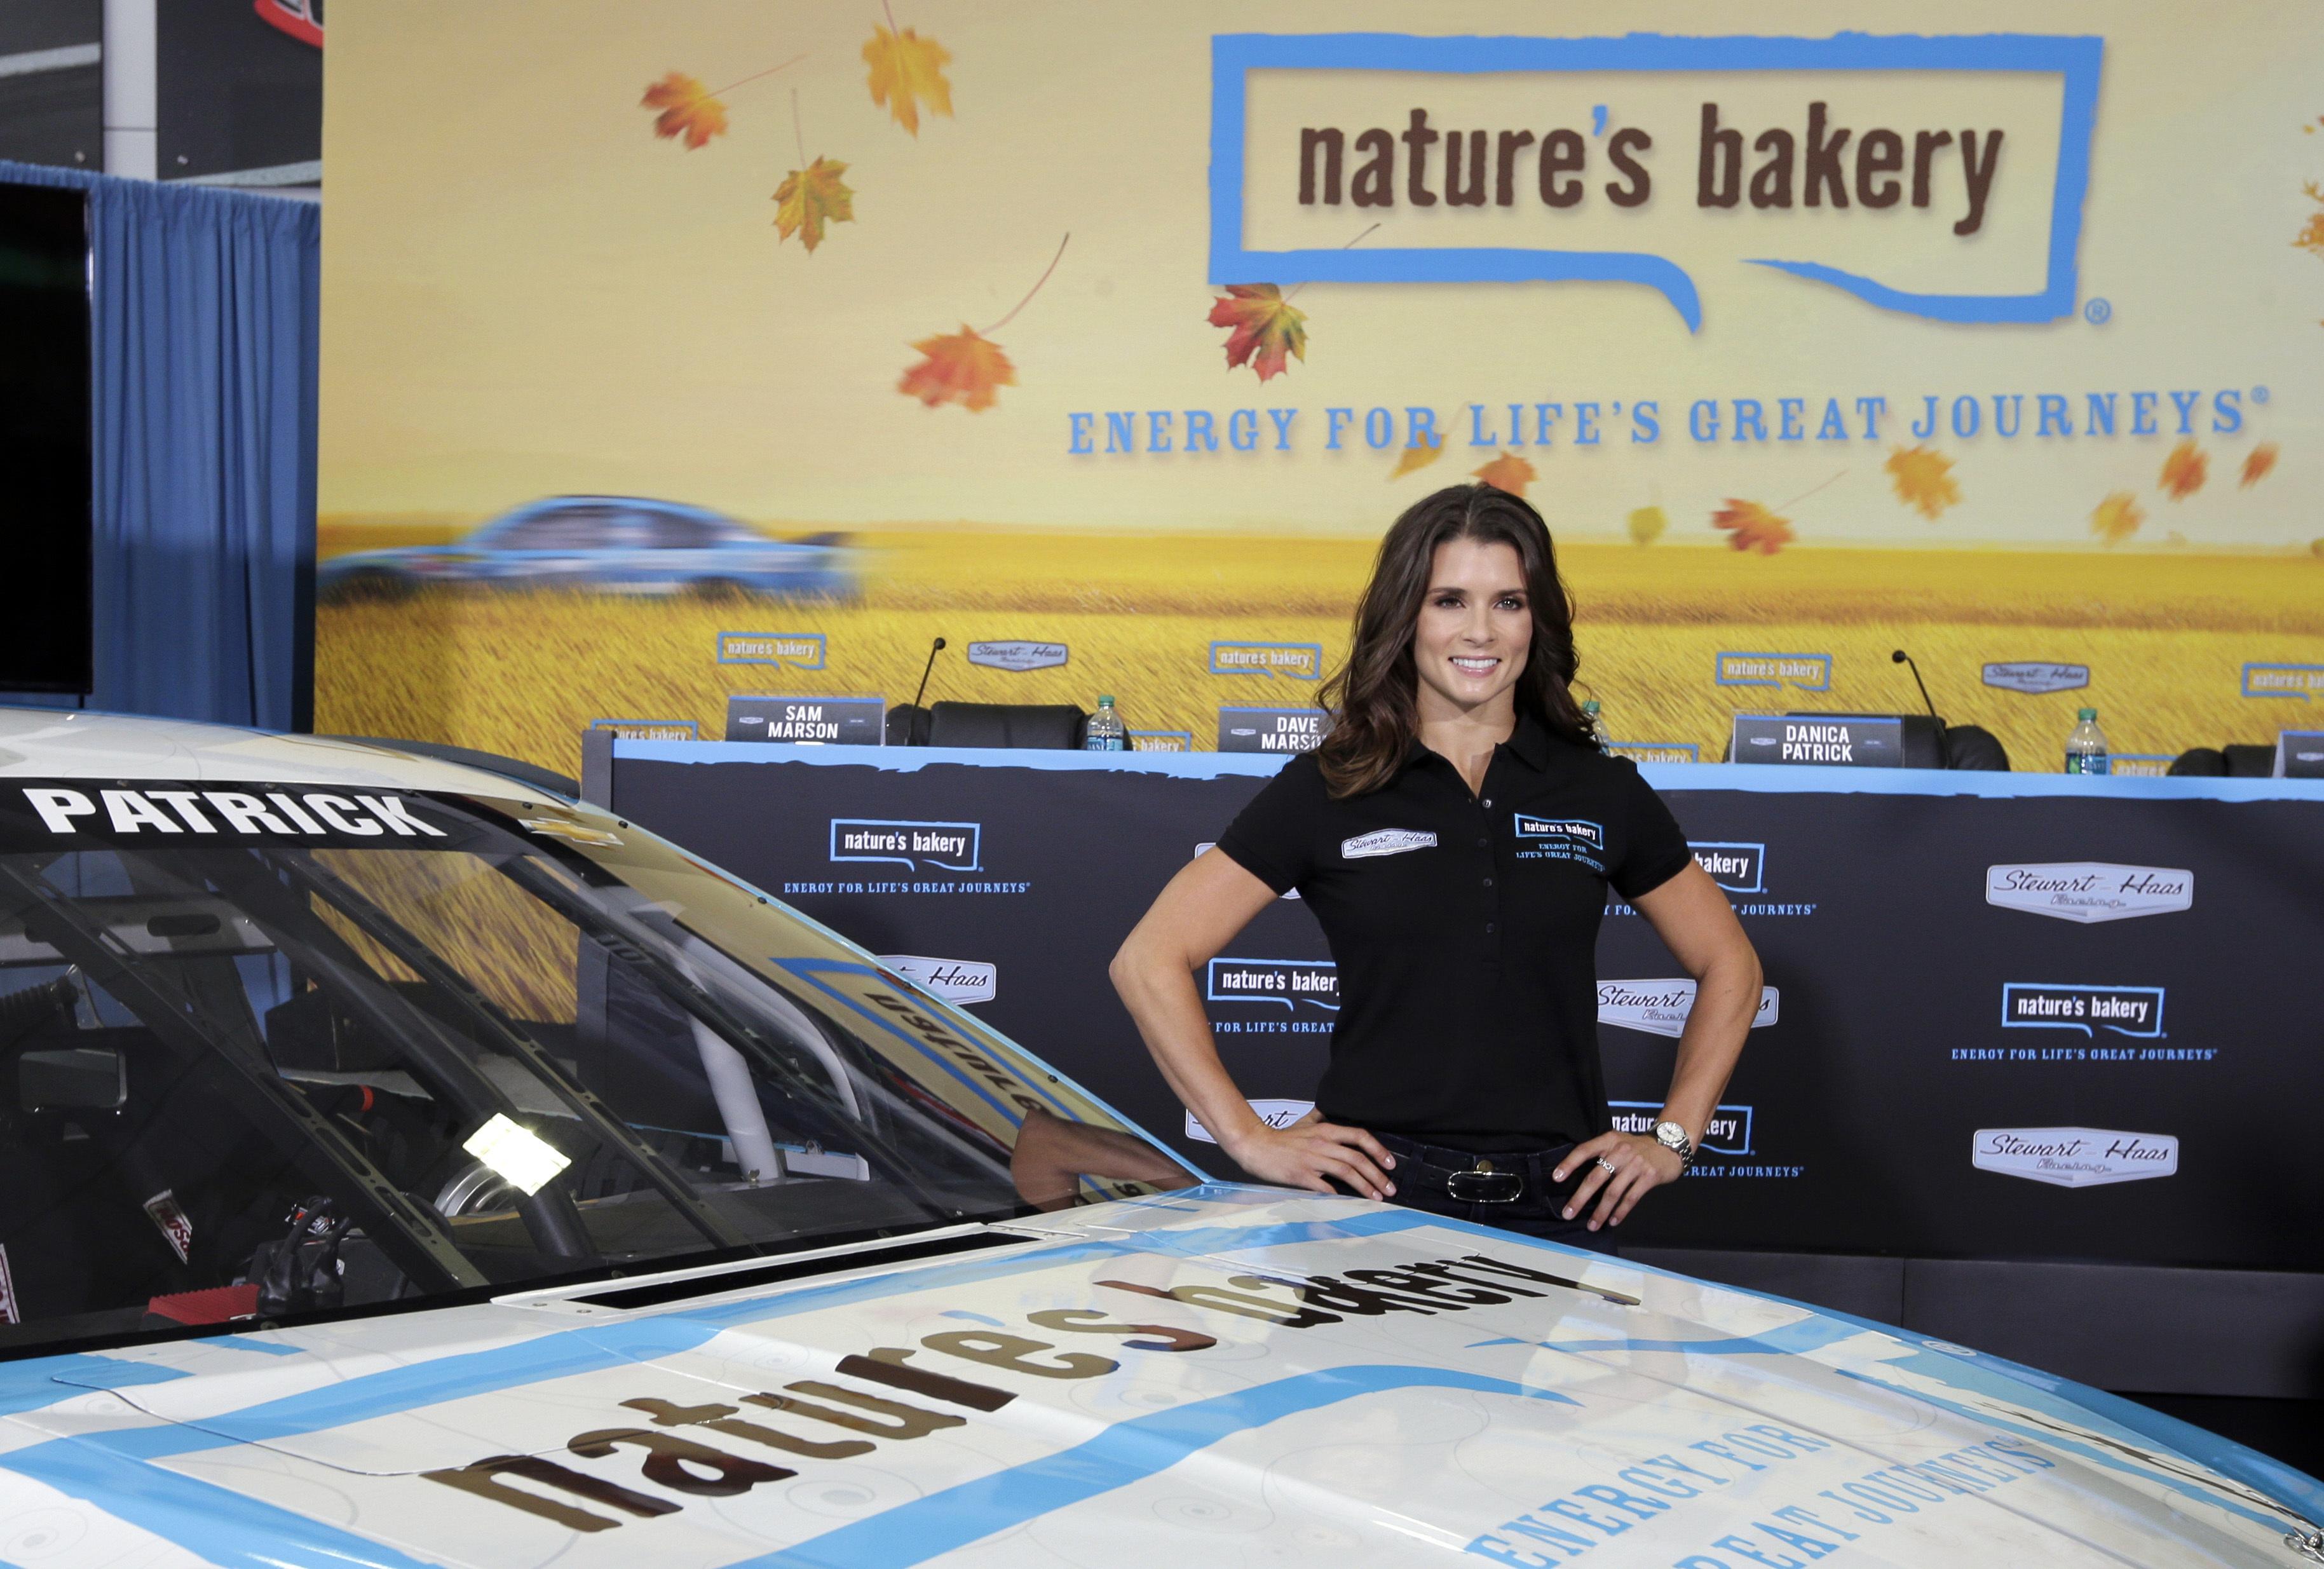 Danica Patricks racing team sues sponsor Natures Bakery – Race Car Sponsorship Contract